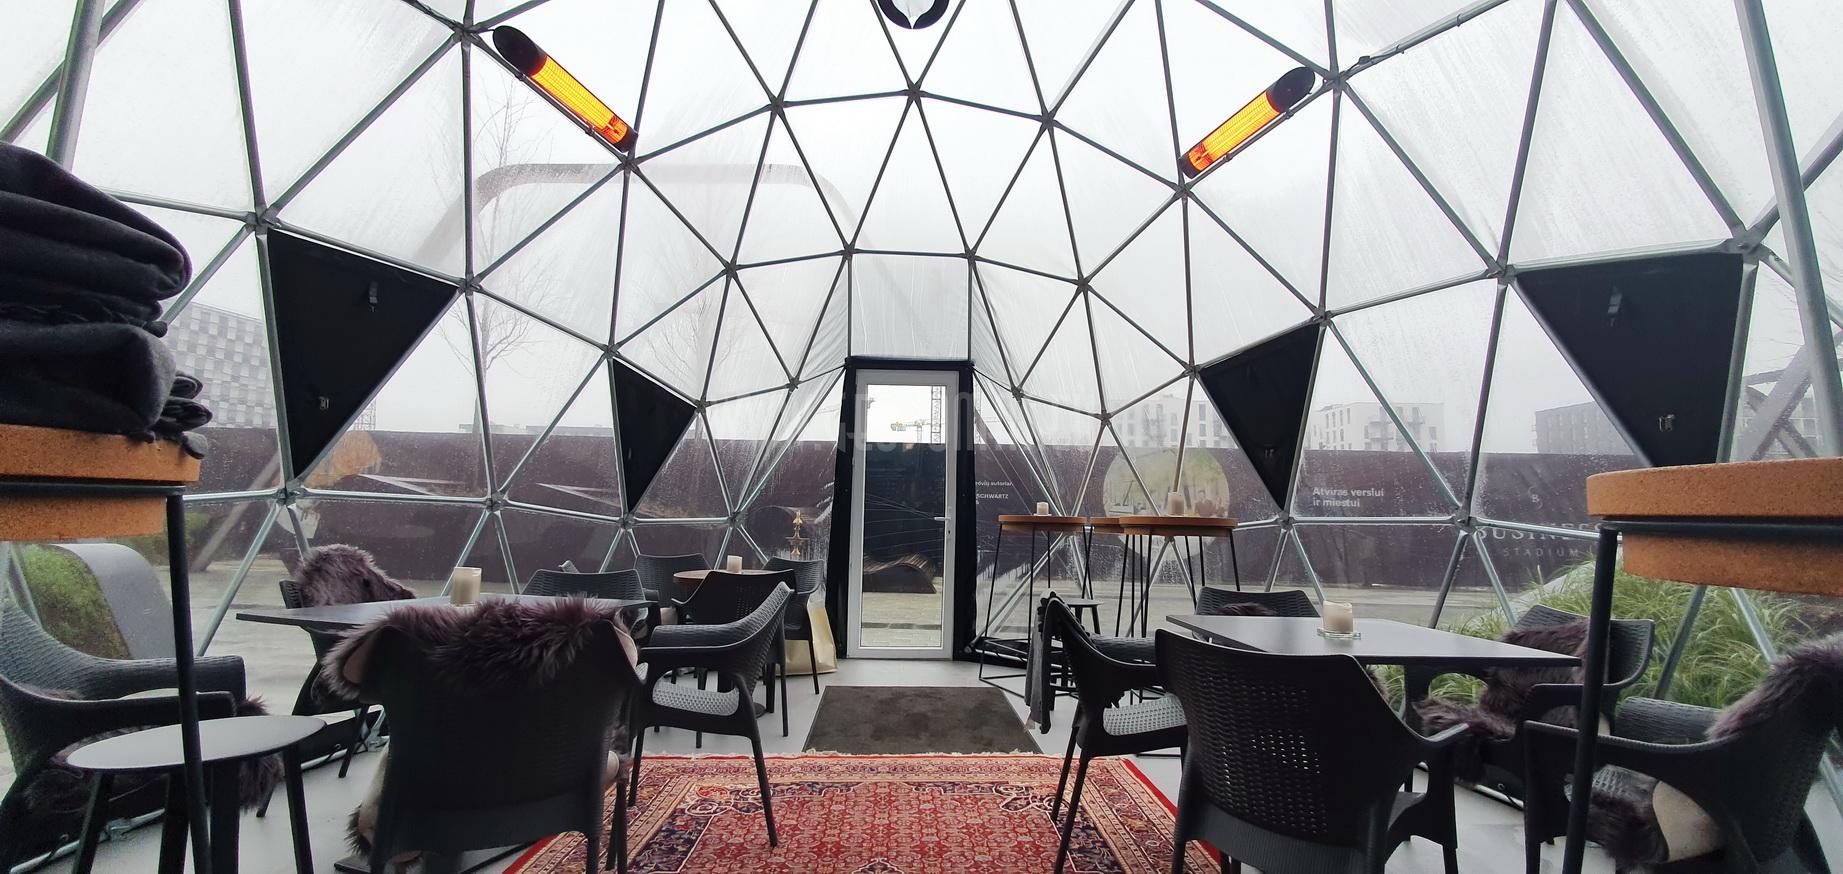 35m² Panoramic Stella Artois Dome Ø7m | Brussels Mussels, Vilnius